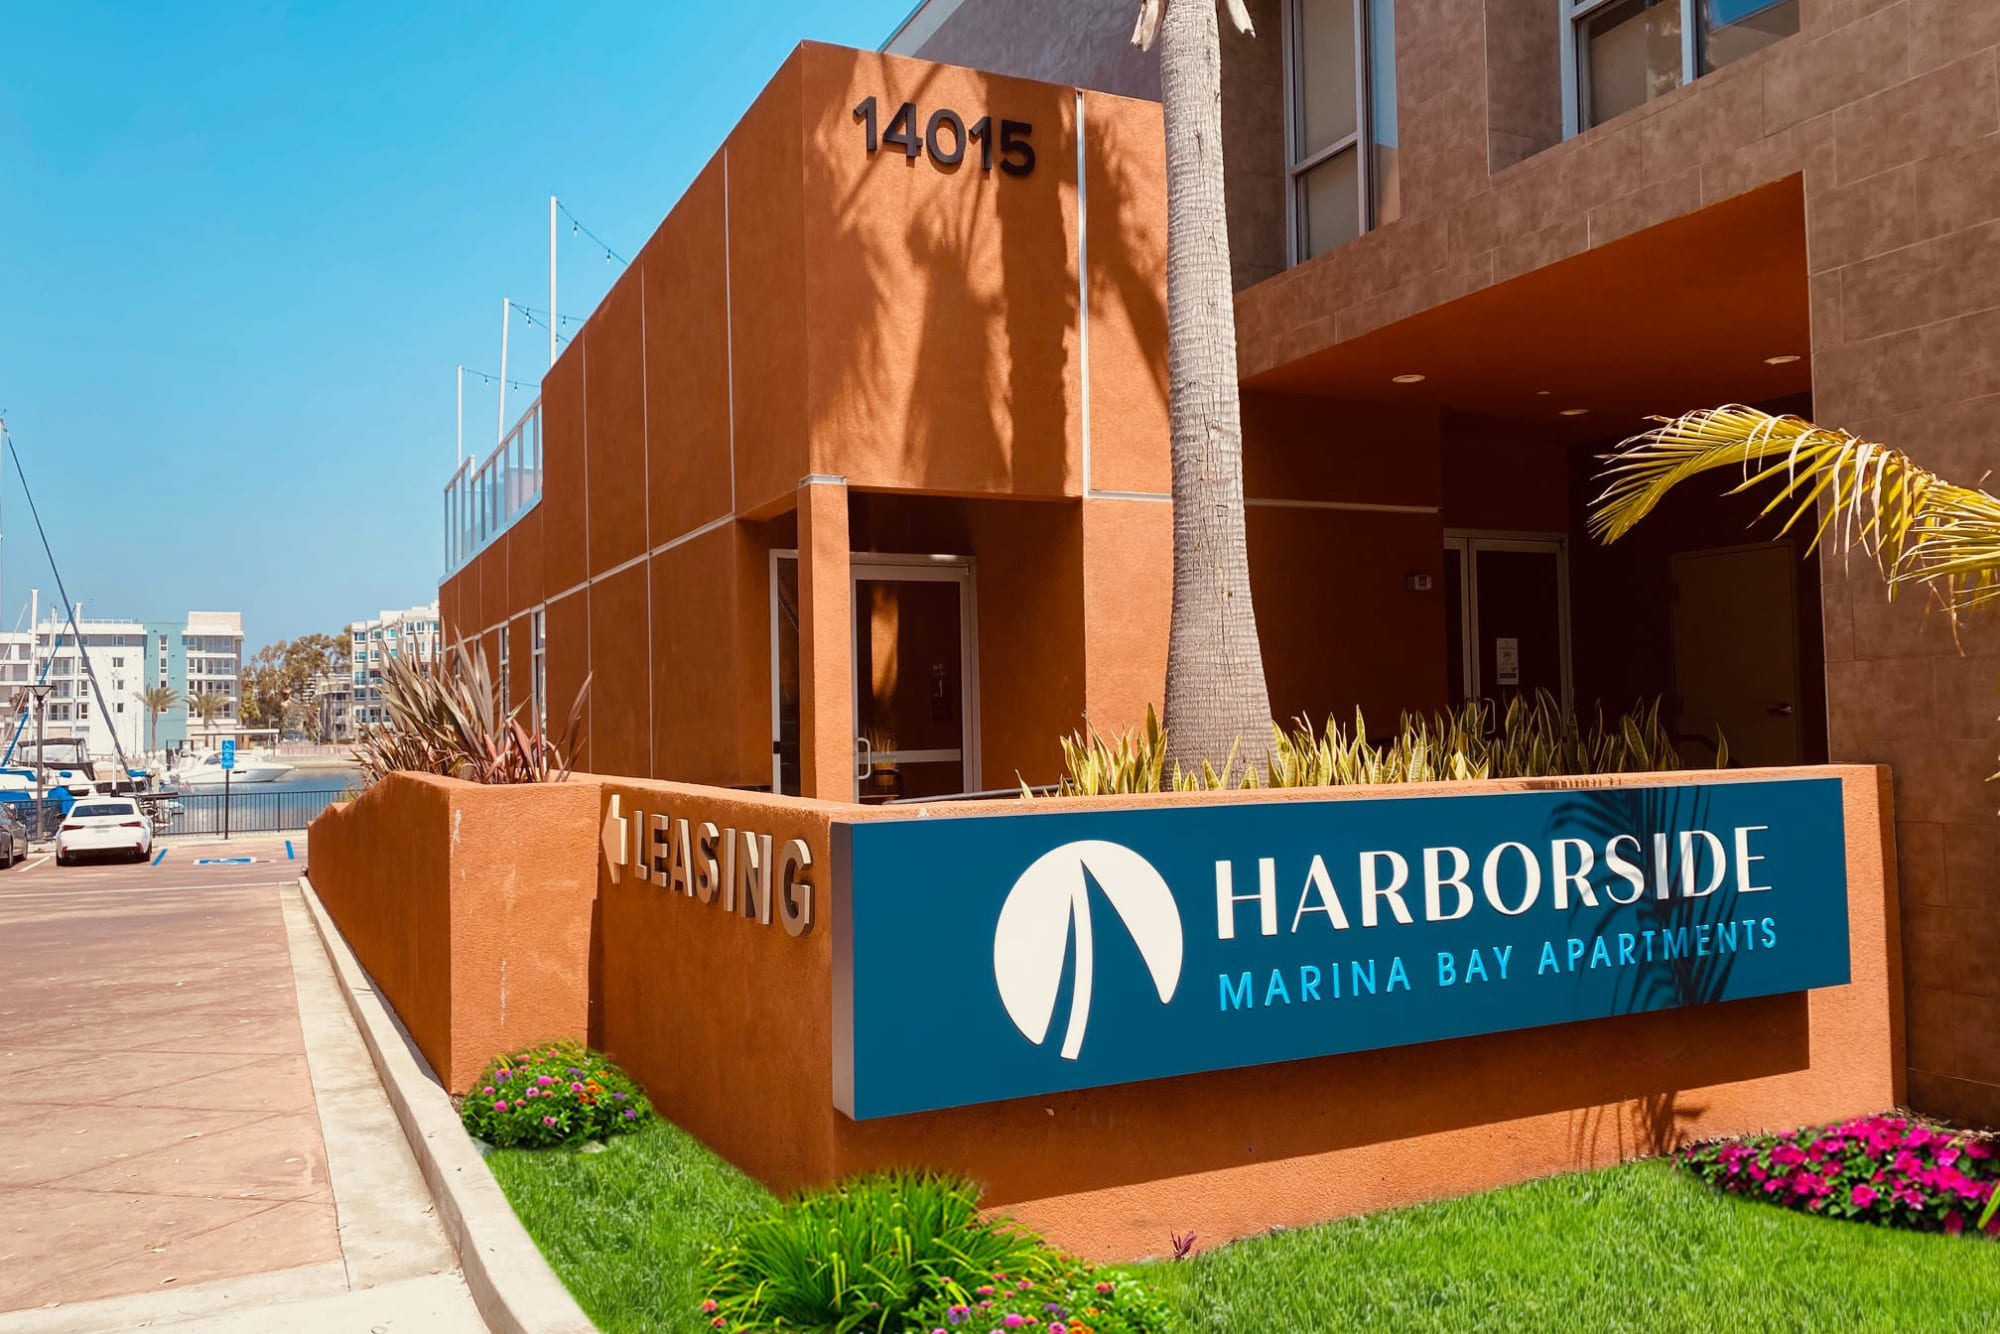 Monument Sign at Harborside Marina Bay Apartments in Marina del Rey, California